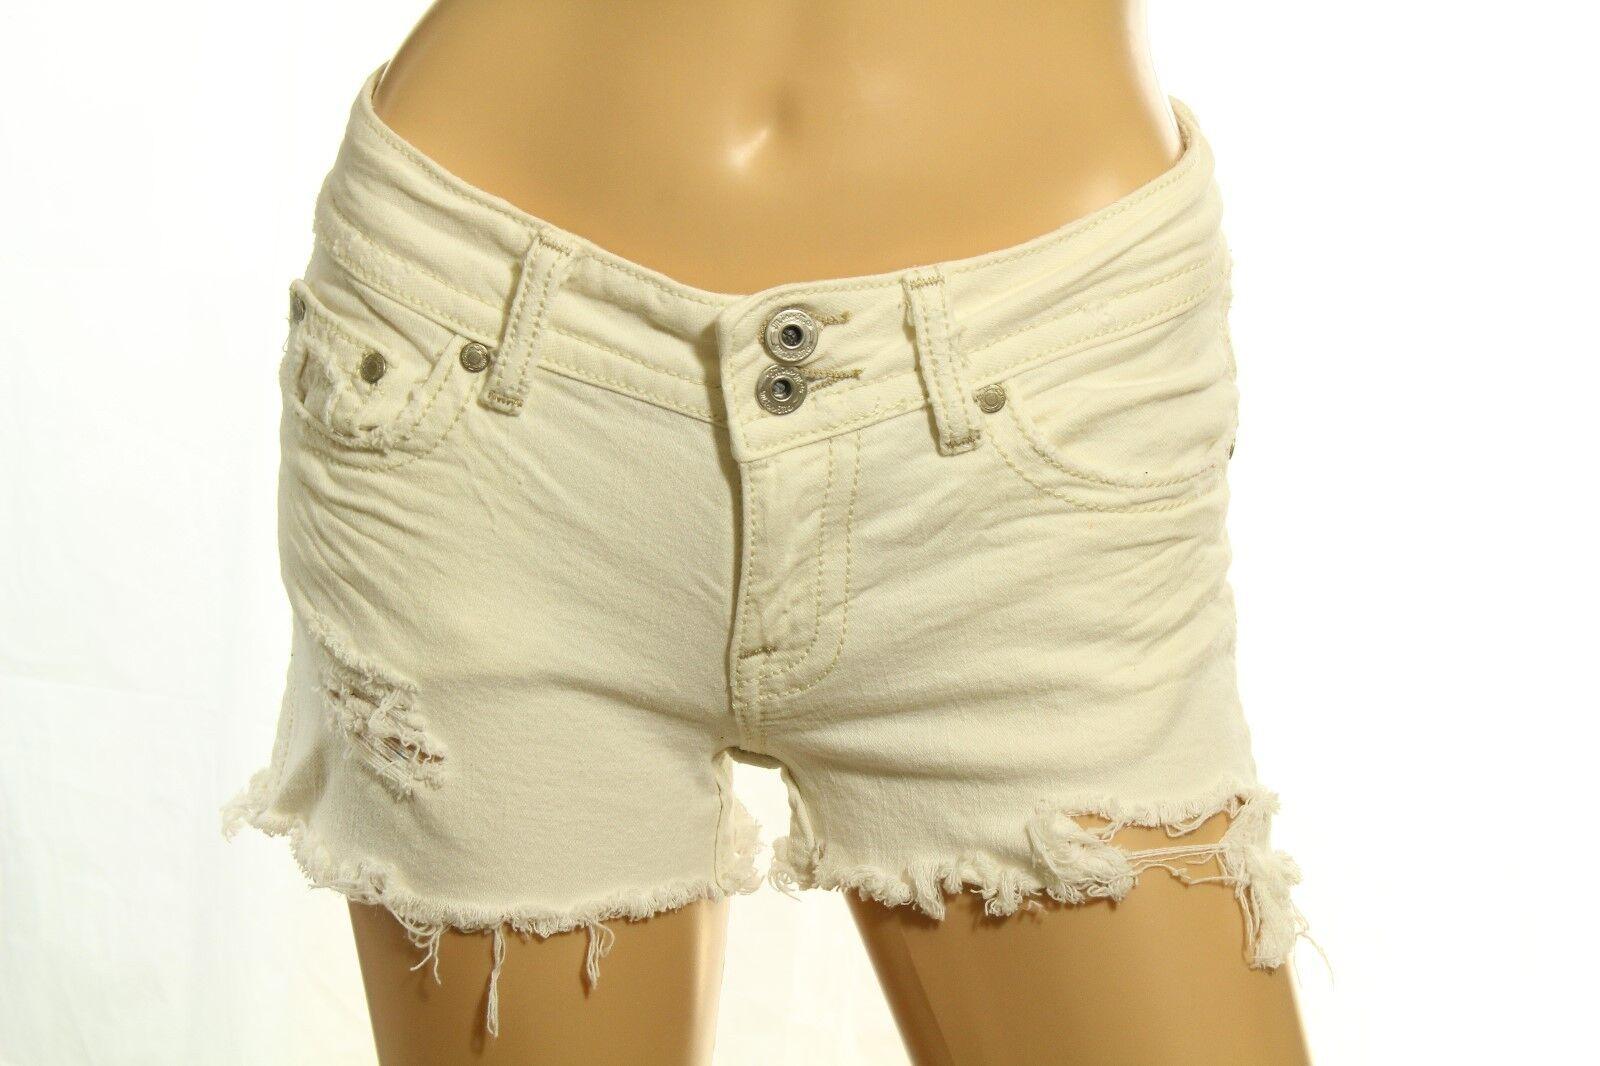 Miss Me Women's Denim Shorts Ivory Distressed Cut Off